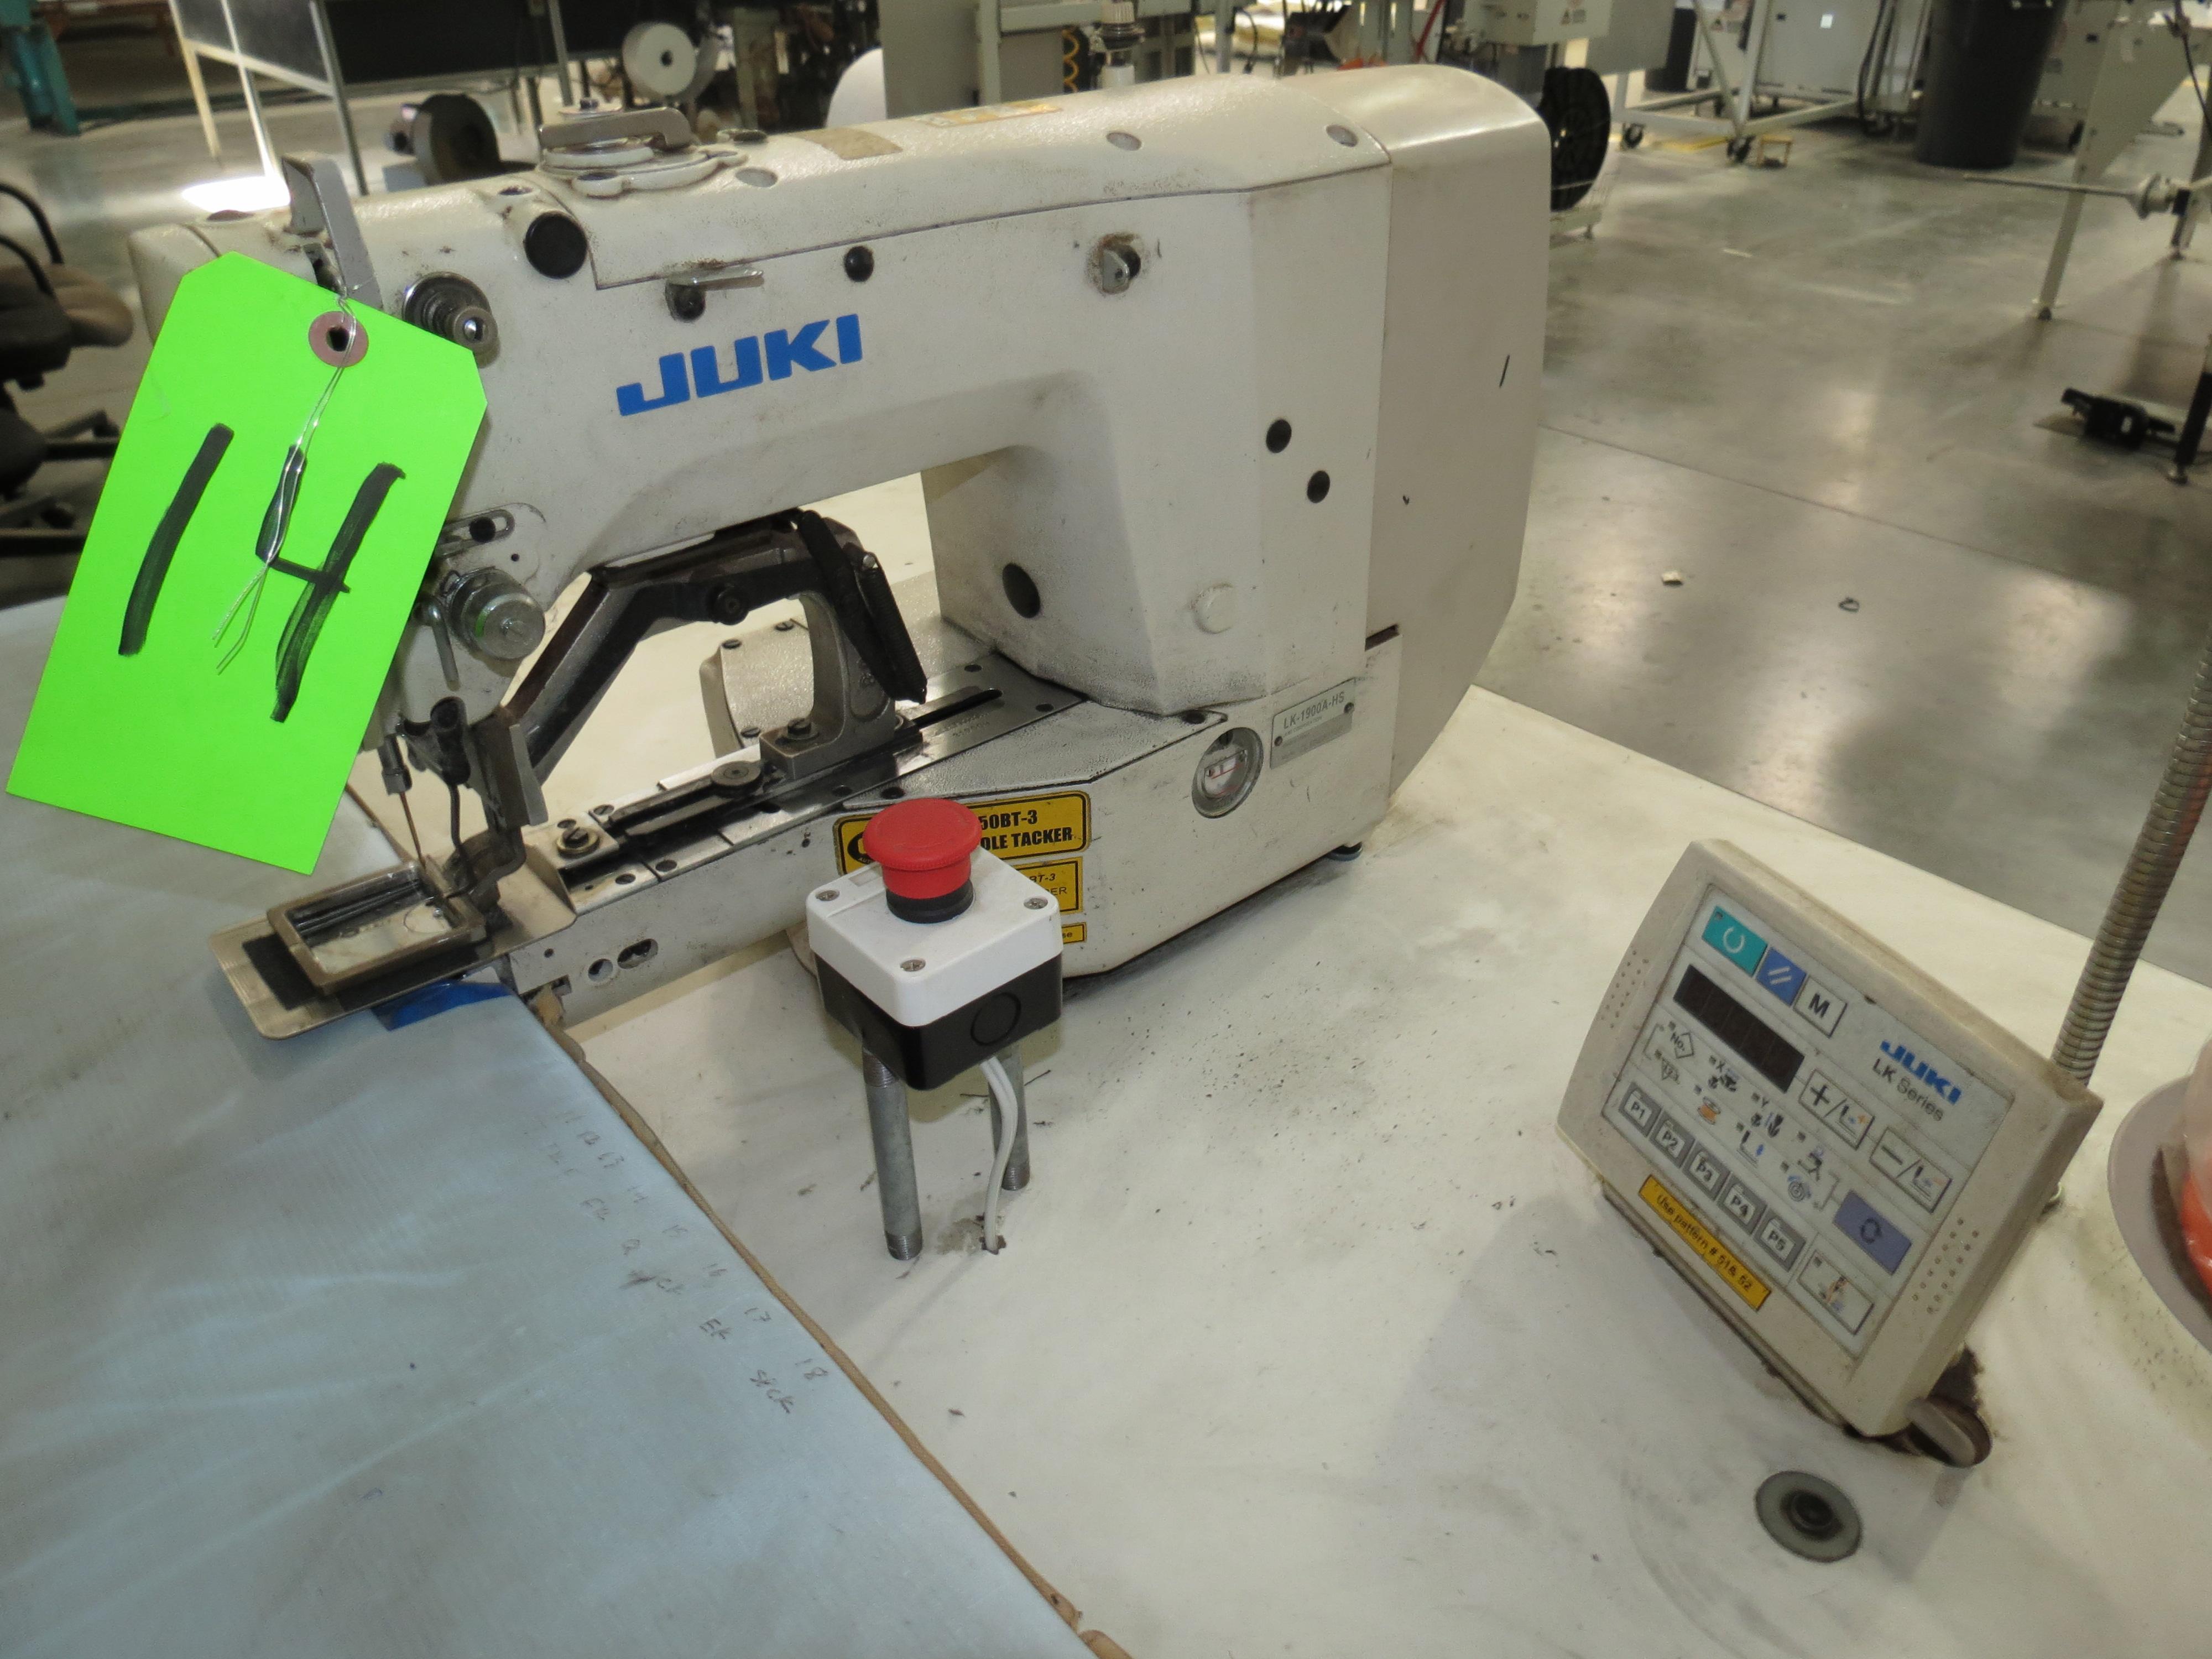 Juki LK-1900A-HSSingle Needle Sewing Machine, 110V, SN: 2L1DE00560 - Image 2 of 2